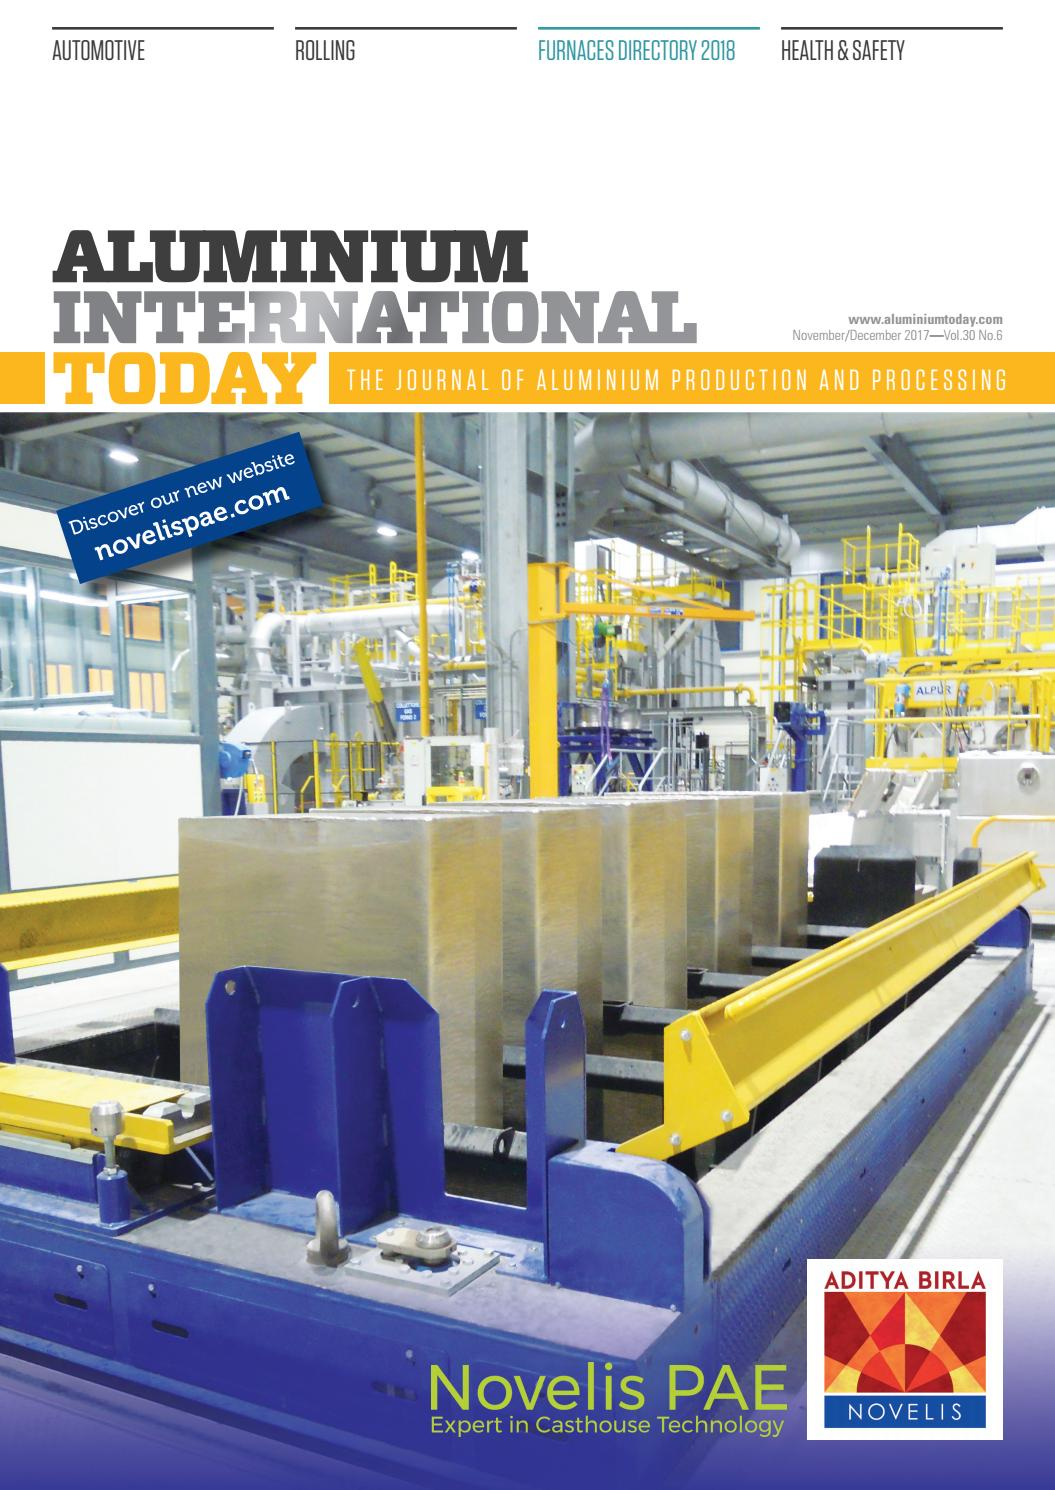 Aluminium International Today November December 2017 by Quartz Business  Media - issuu c353a2d98ea